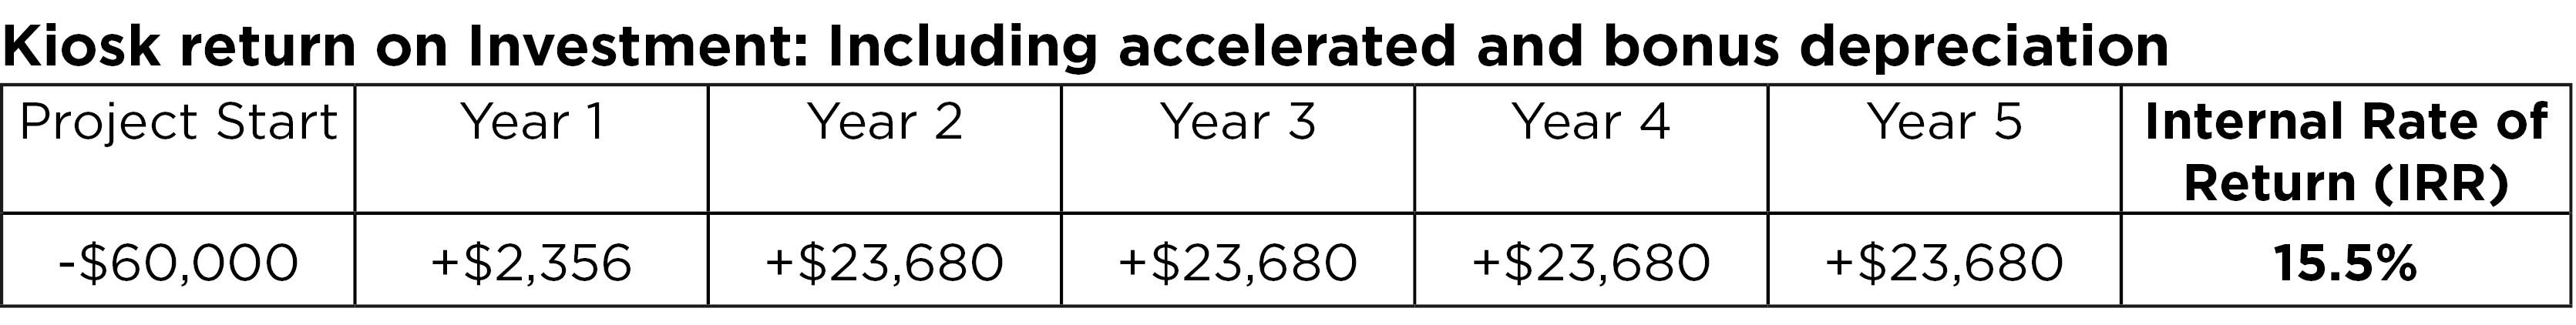 Kiosk return on investment: Including accelerated and bonus depreciation